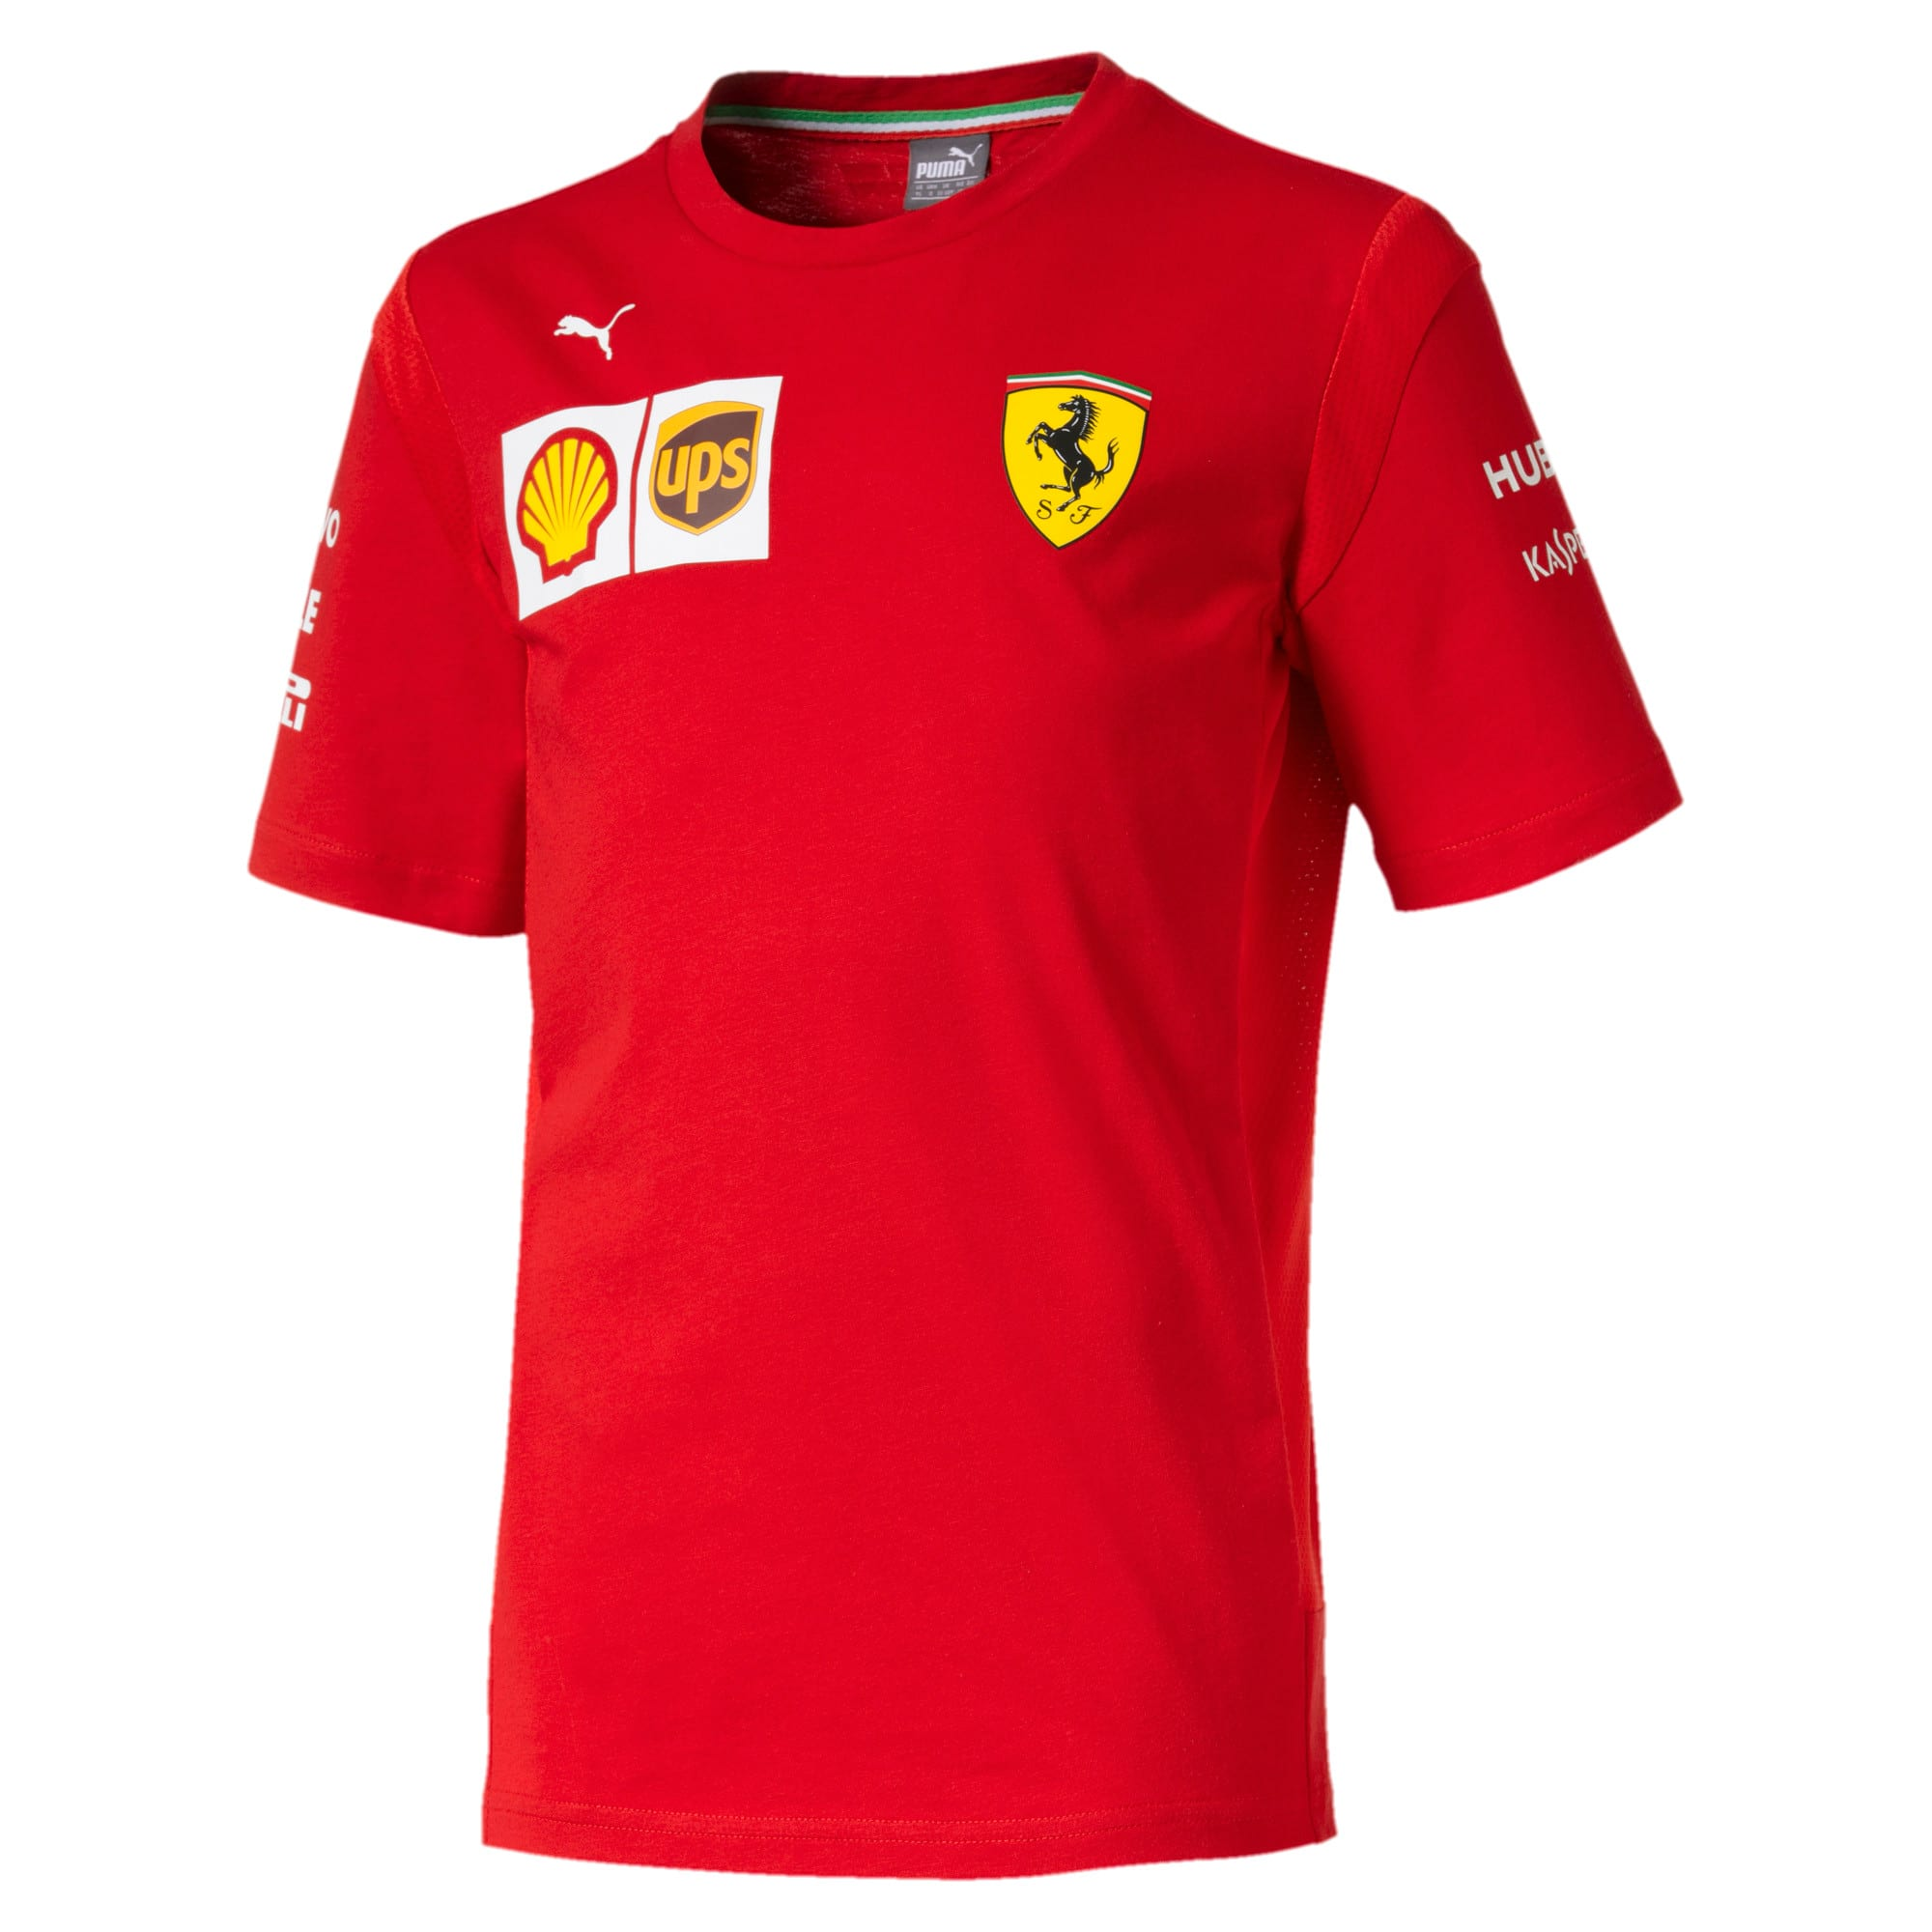 Thumbnail 1 of Ferrari Team Boys' Tee, Rosso Corsa, medium